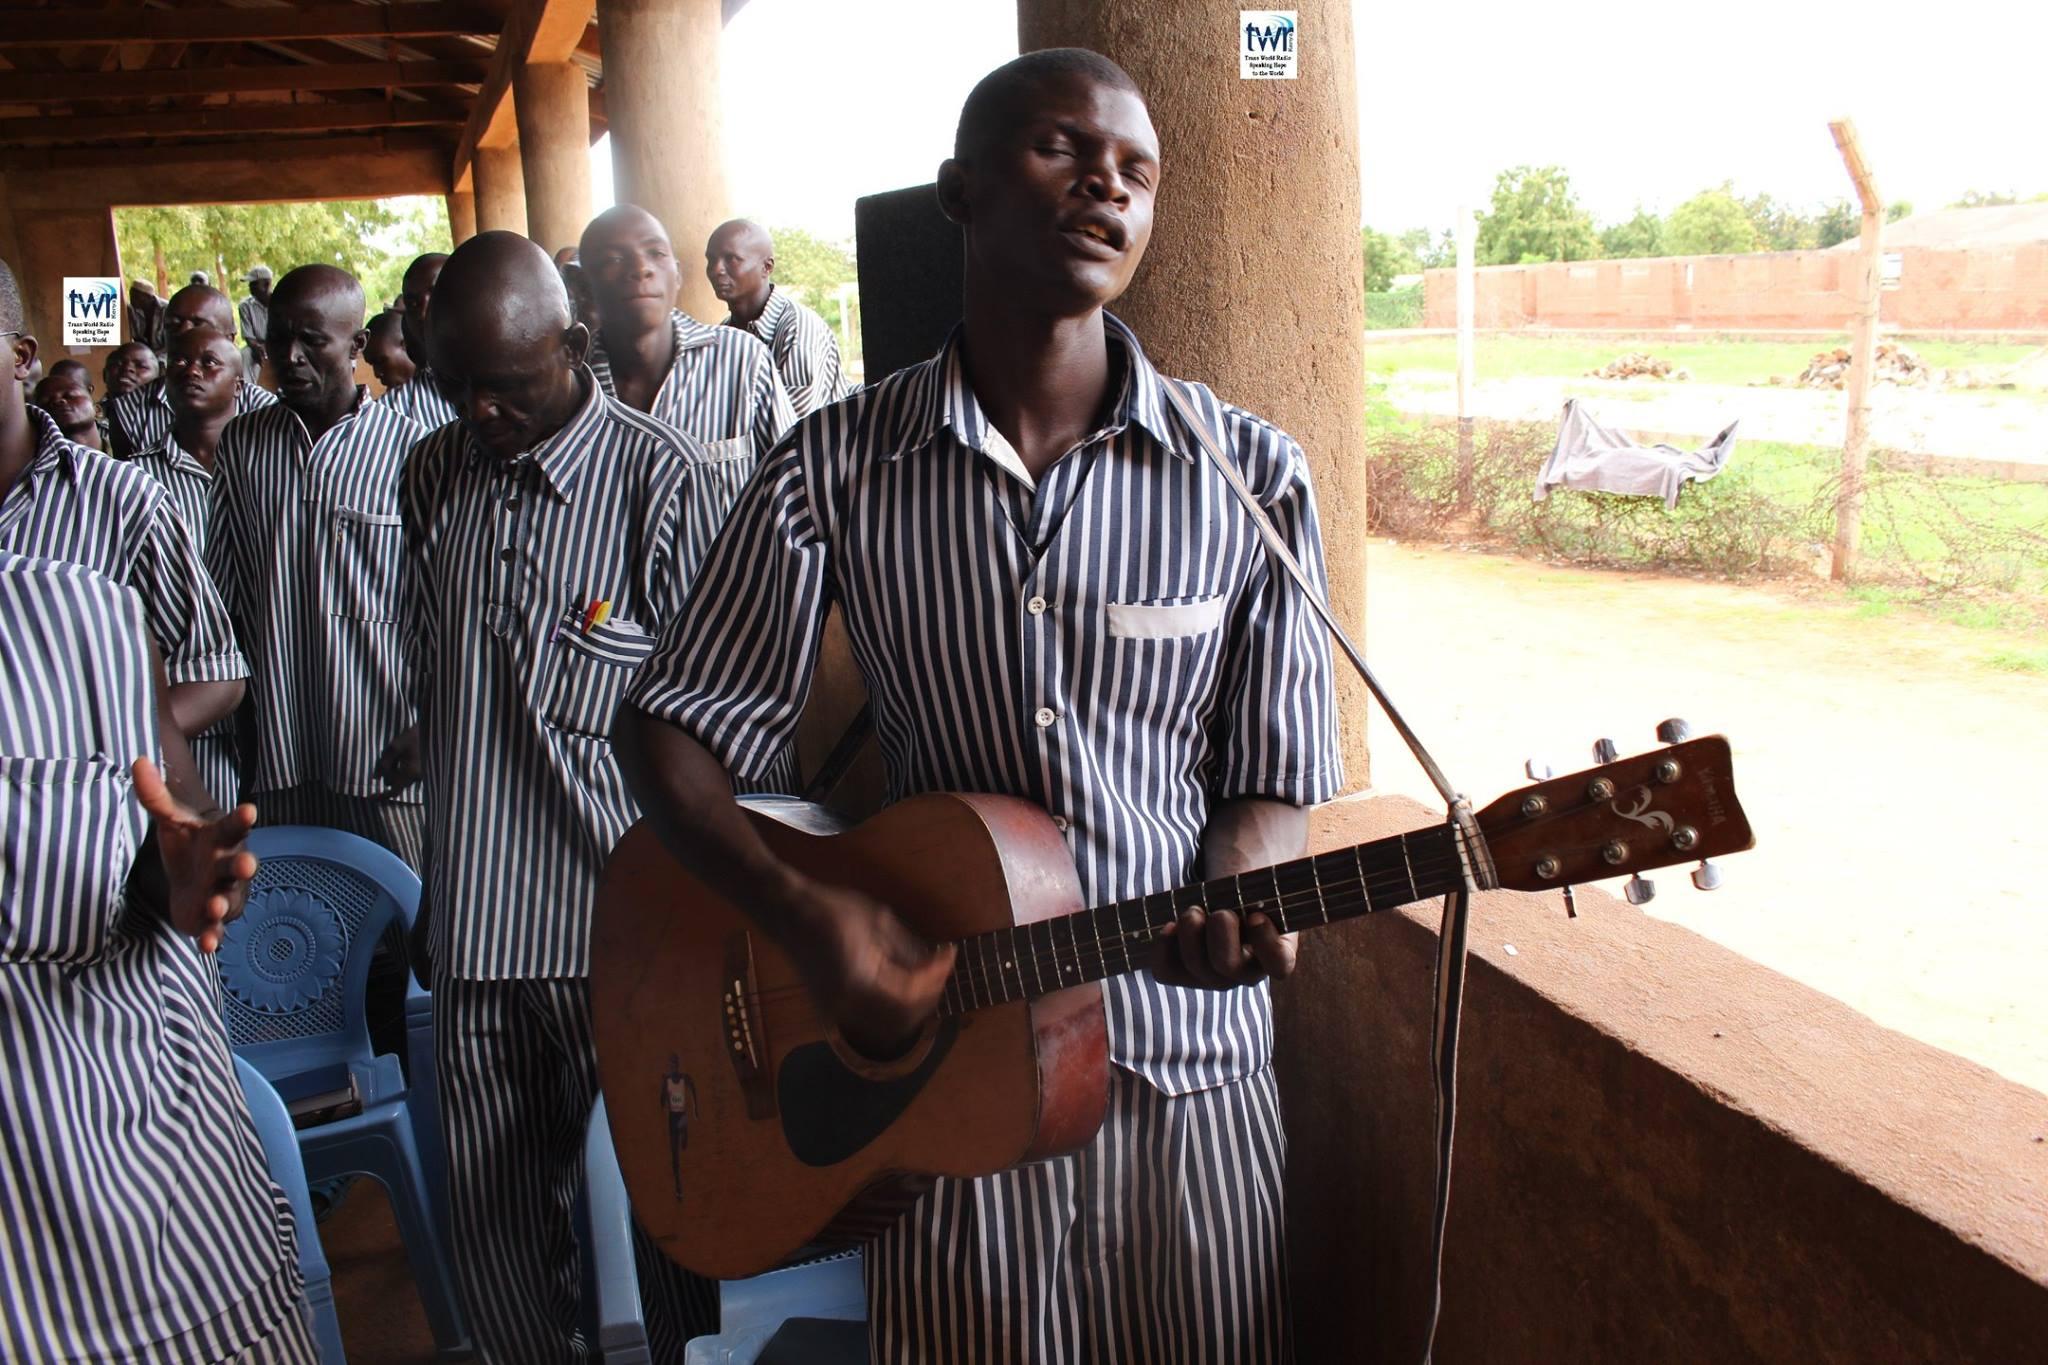 TWR_Kenya prison2